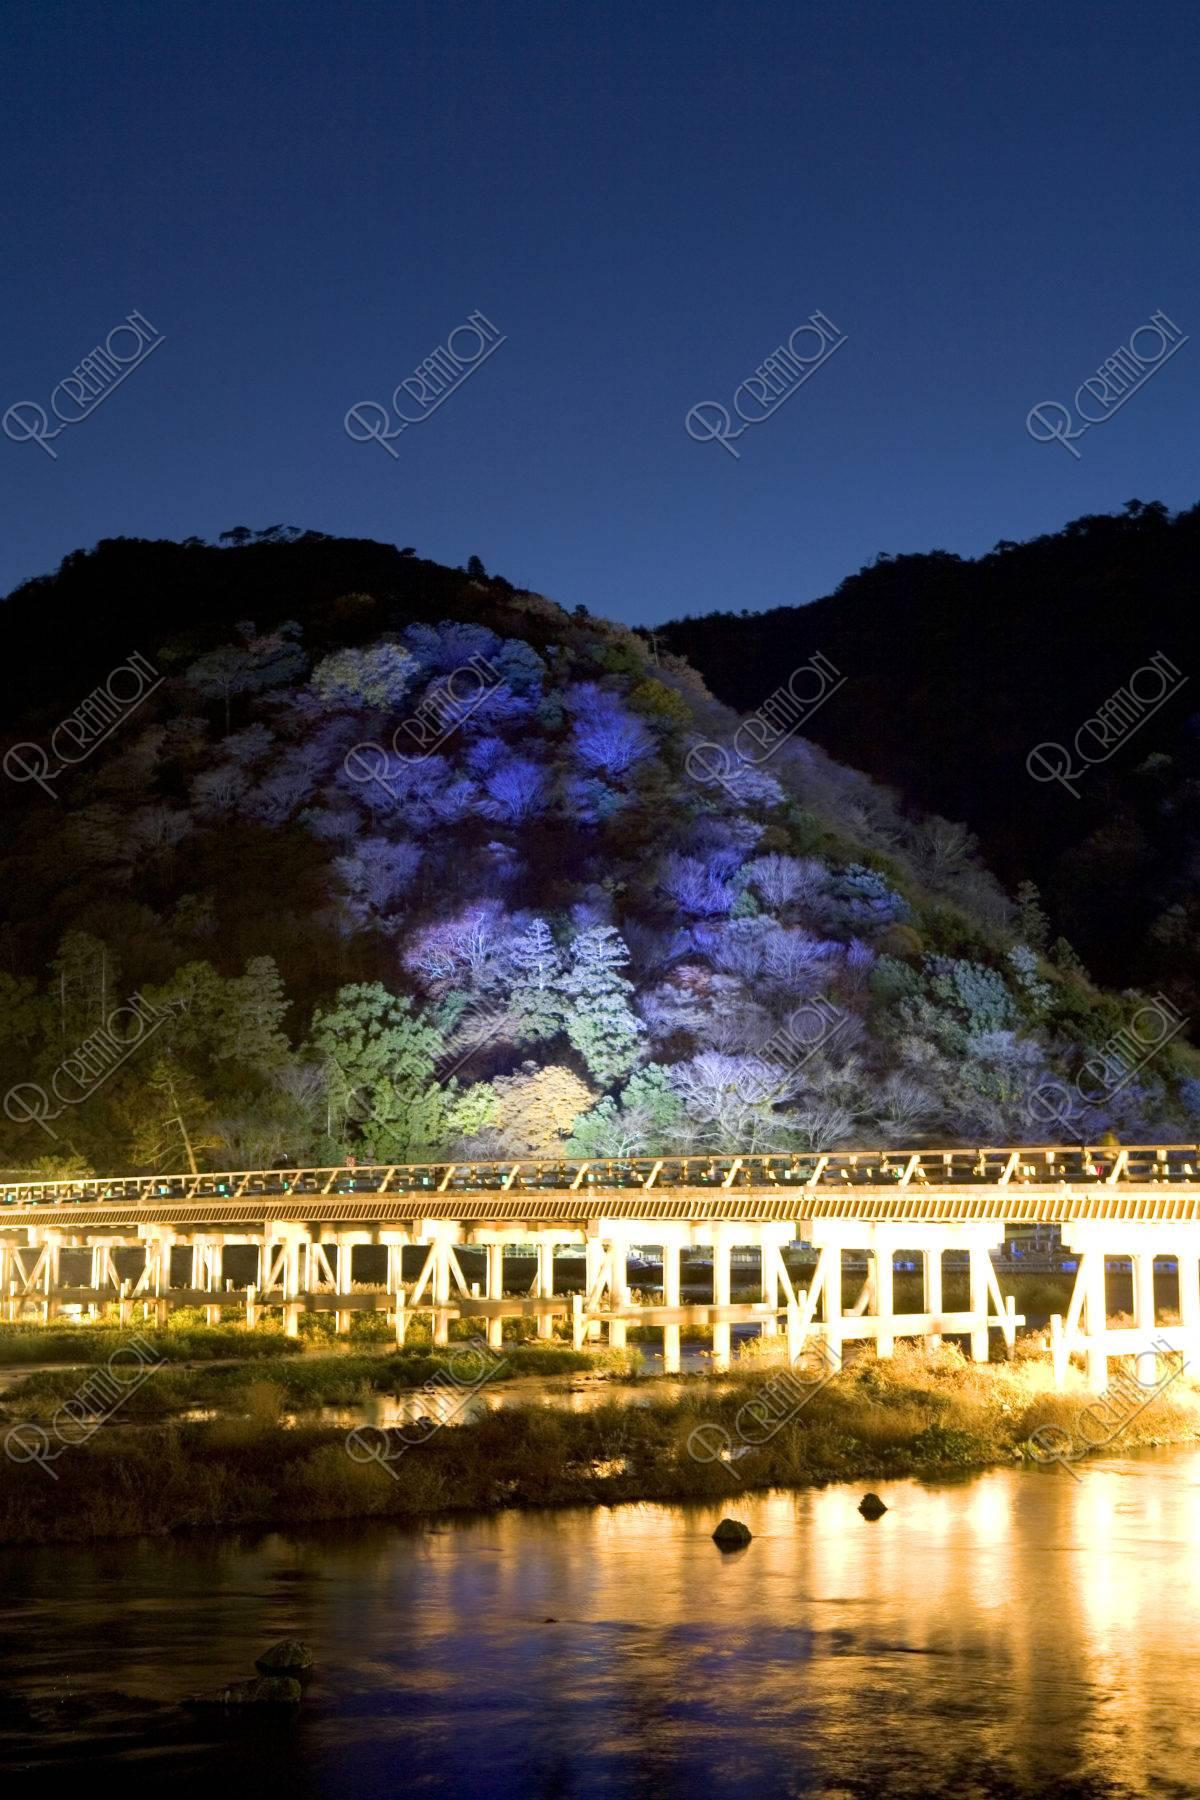 嵐山渡月橋と花灯路 12月